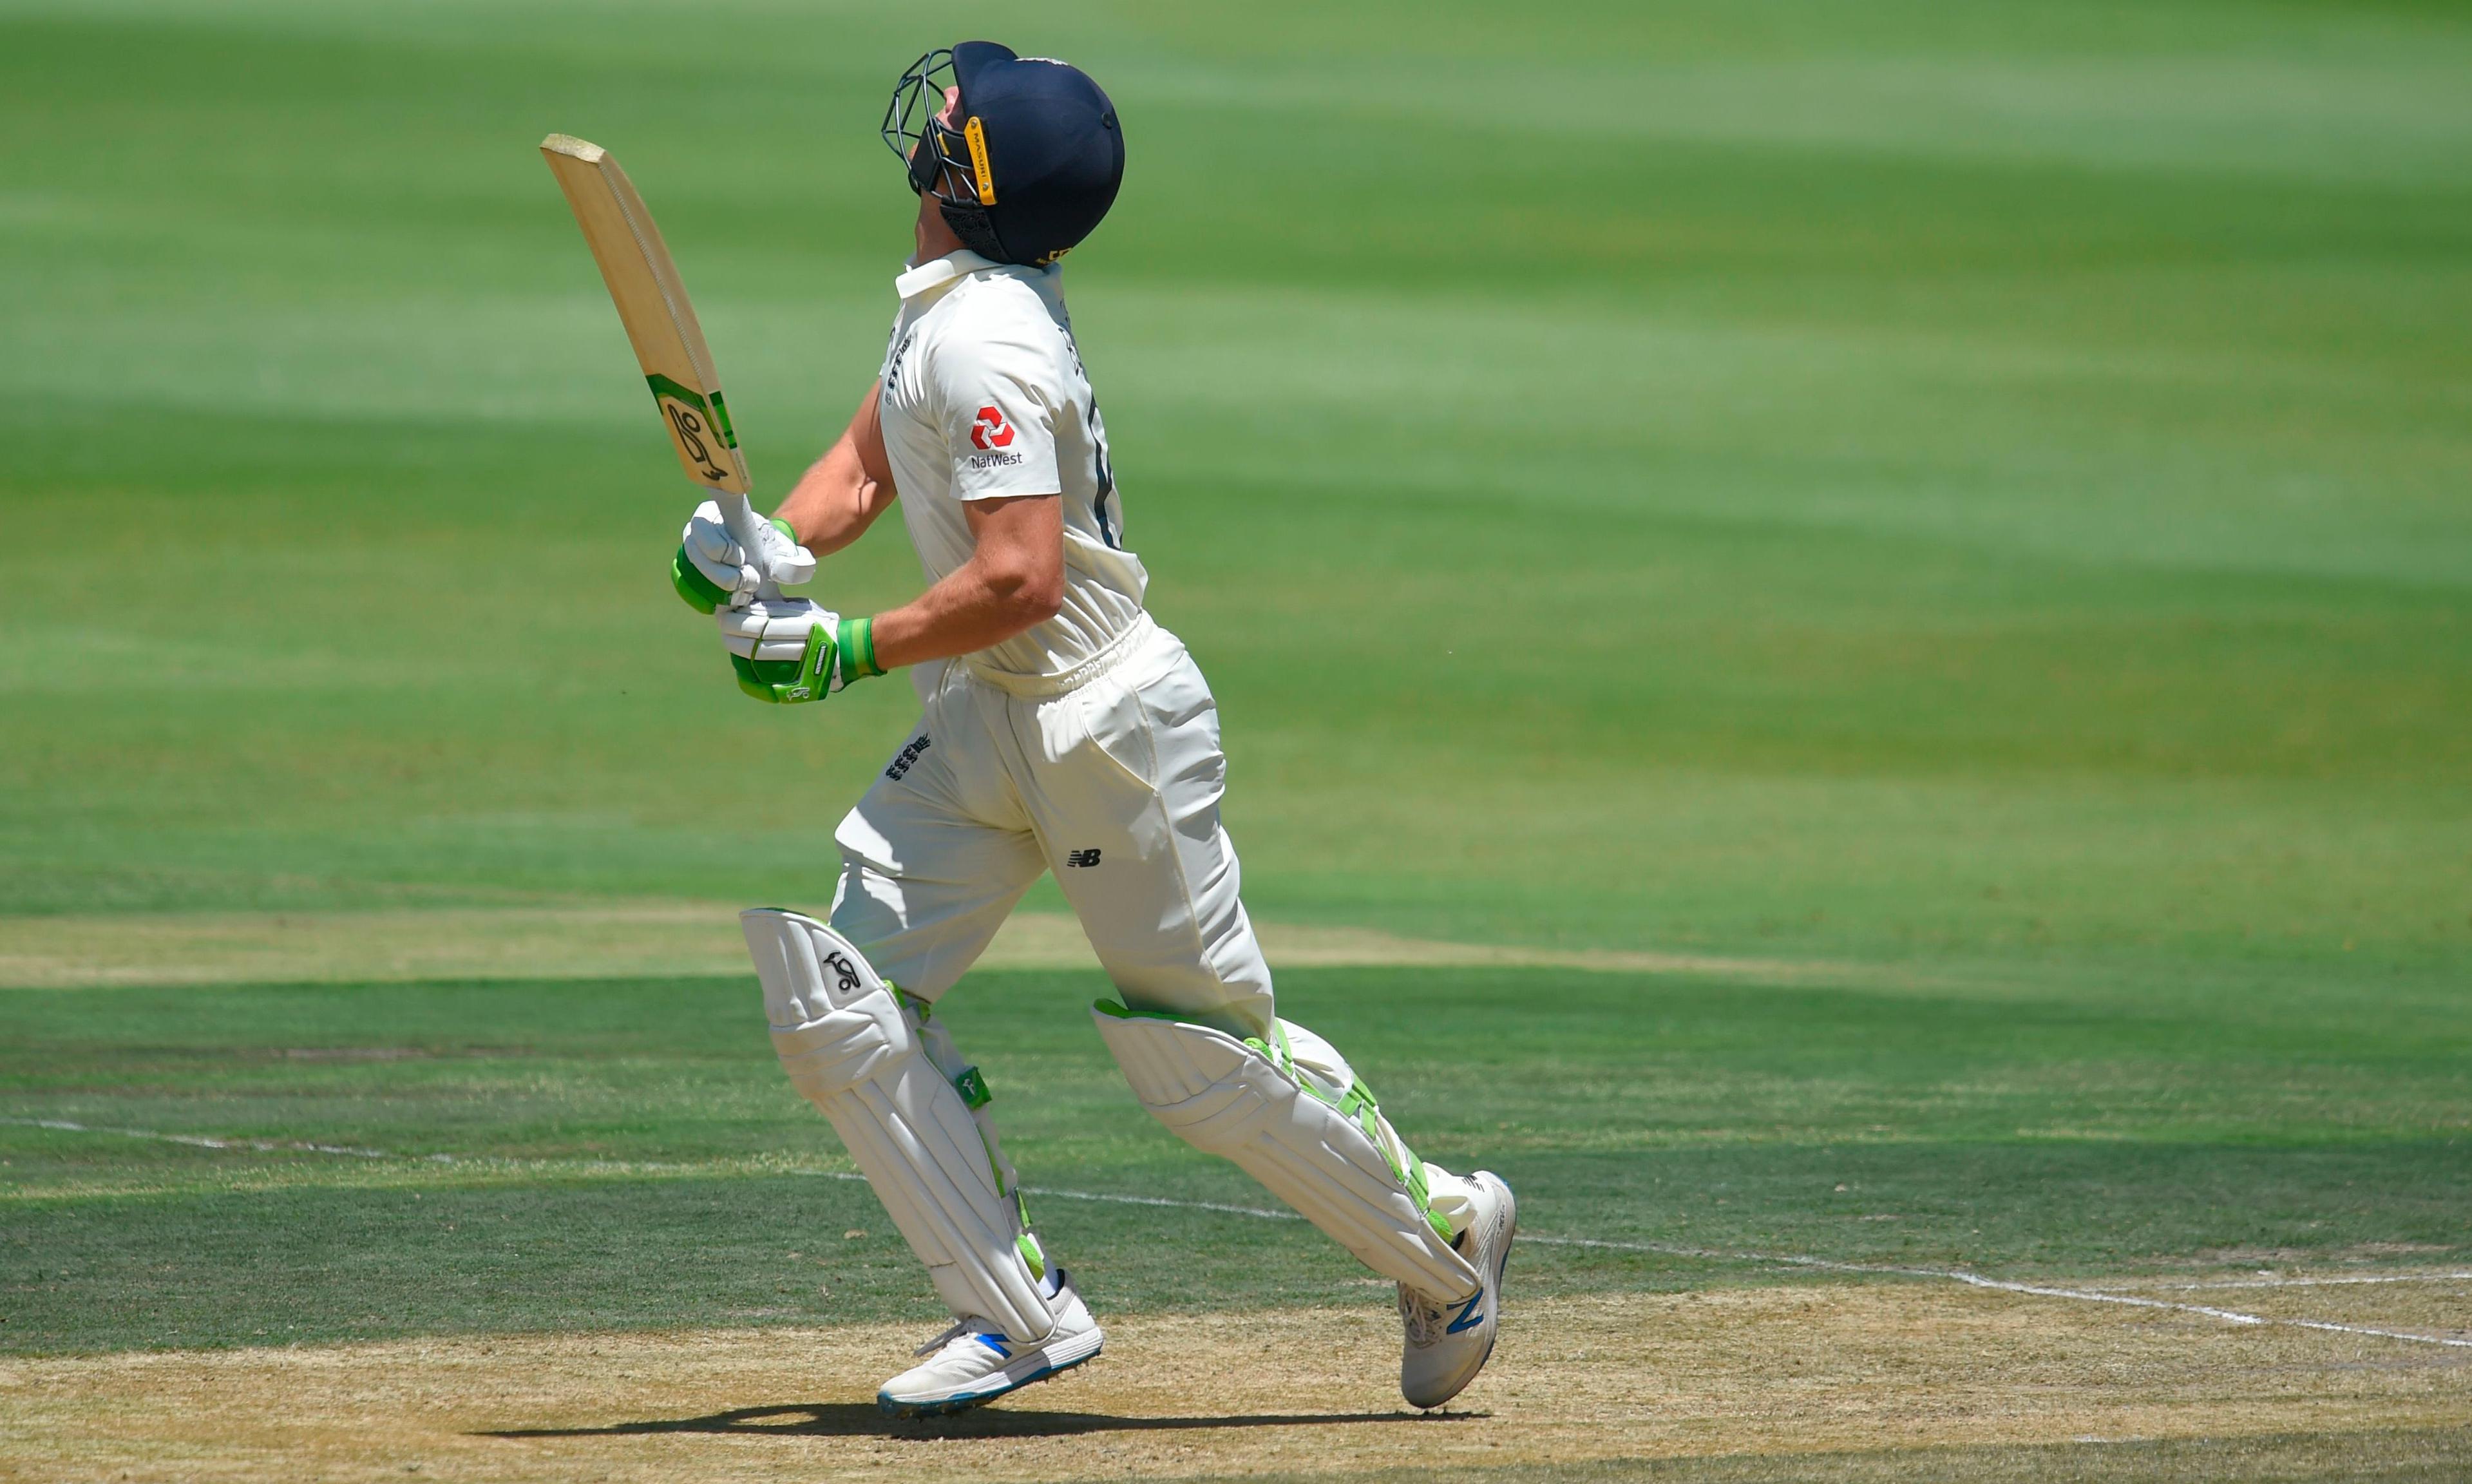 Jos Buttler's batting struggles demand a rethink from England